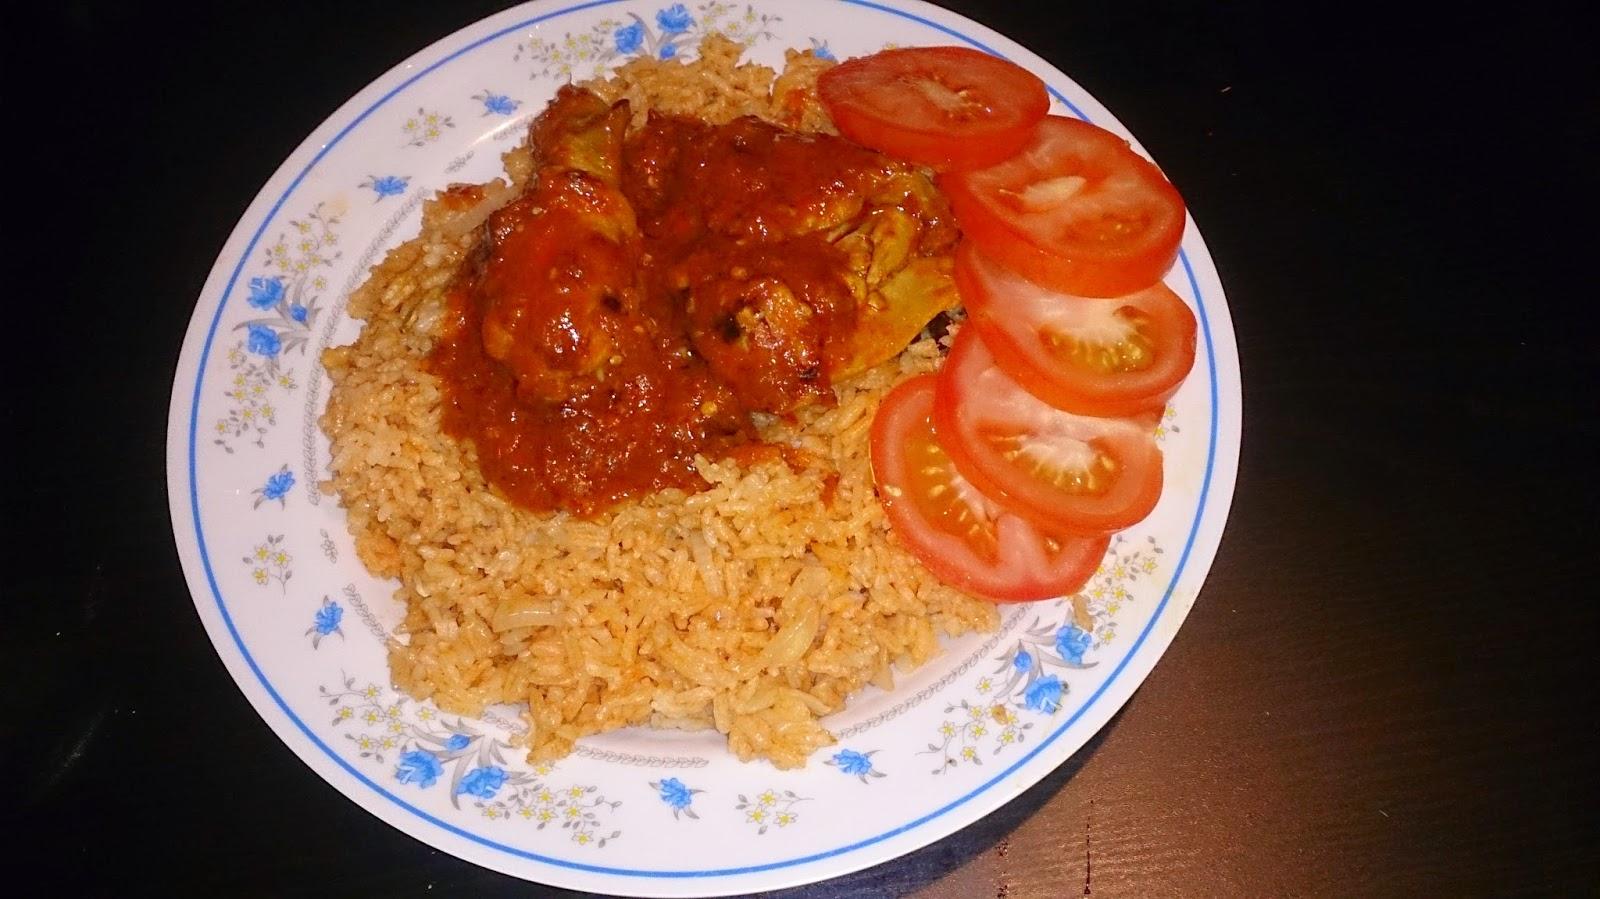 Nasi Tomato Zutaten 1 Bj Ba Merah Hiris 2 Kalau Kecil 3 Putih Seinci Halia Bunga La Cengkih Kayu Manis Buah Pelaga